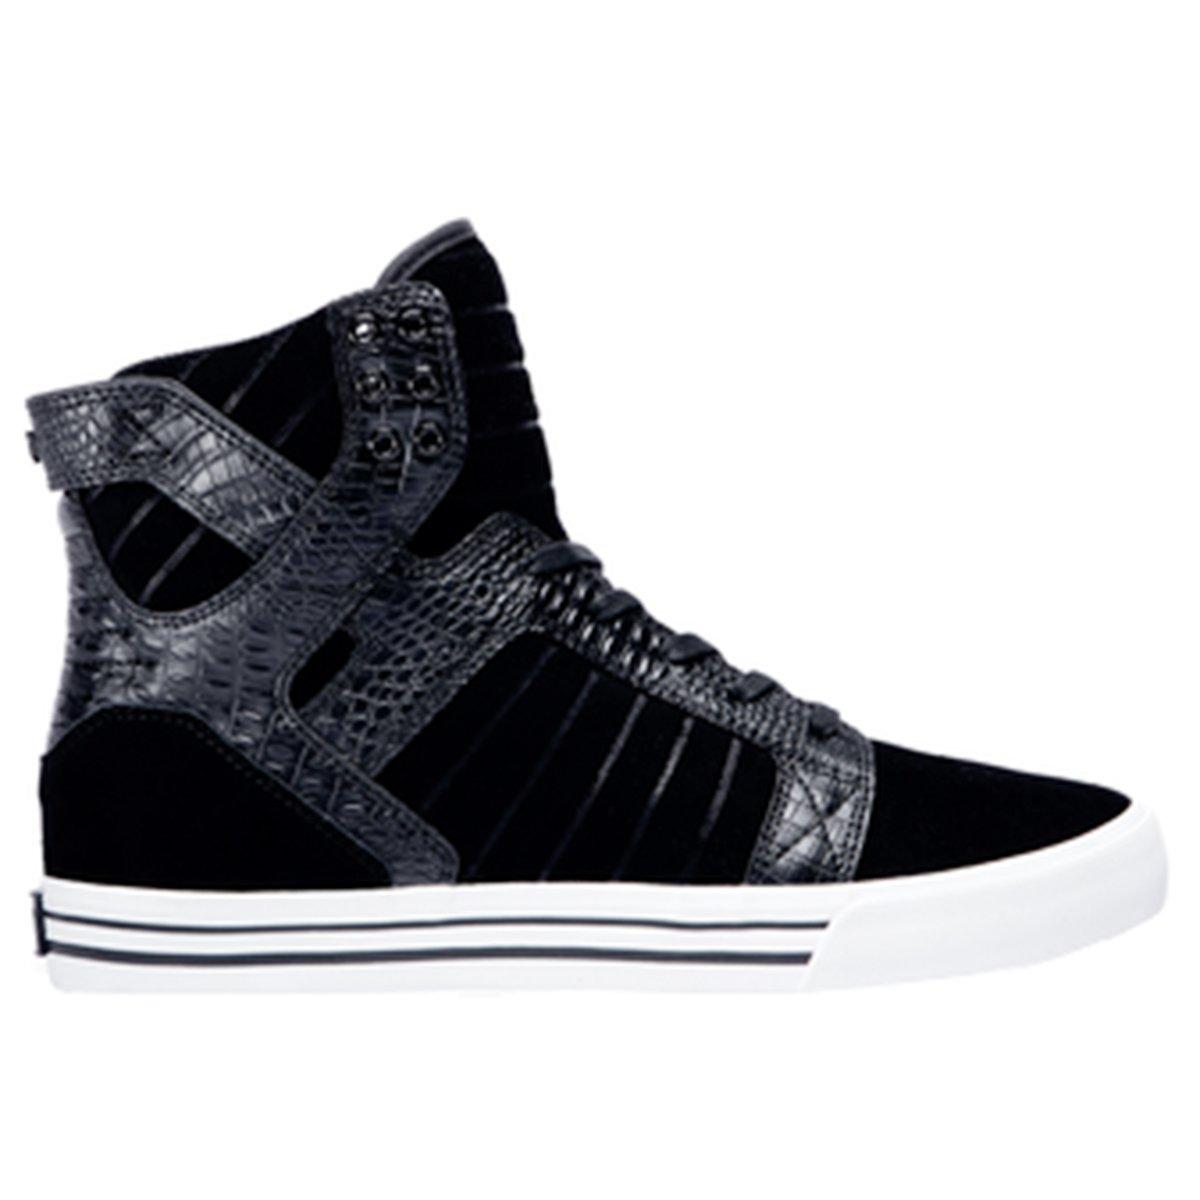 e9dedb96606 Galleon - Supra Mens Skytop Shoes Size 9.5 Black / Croc - White